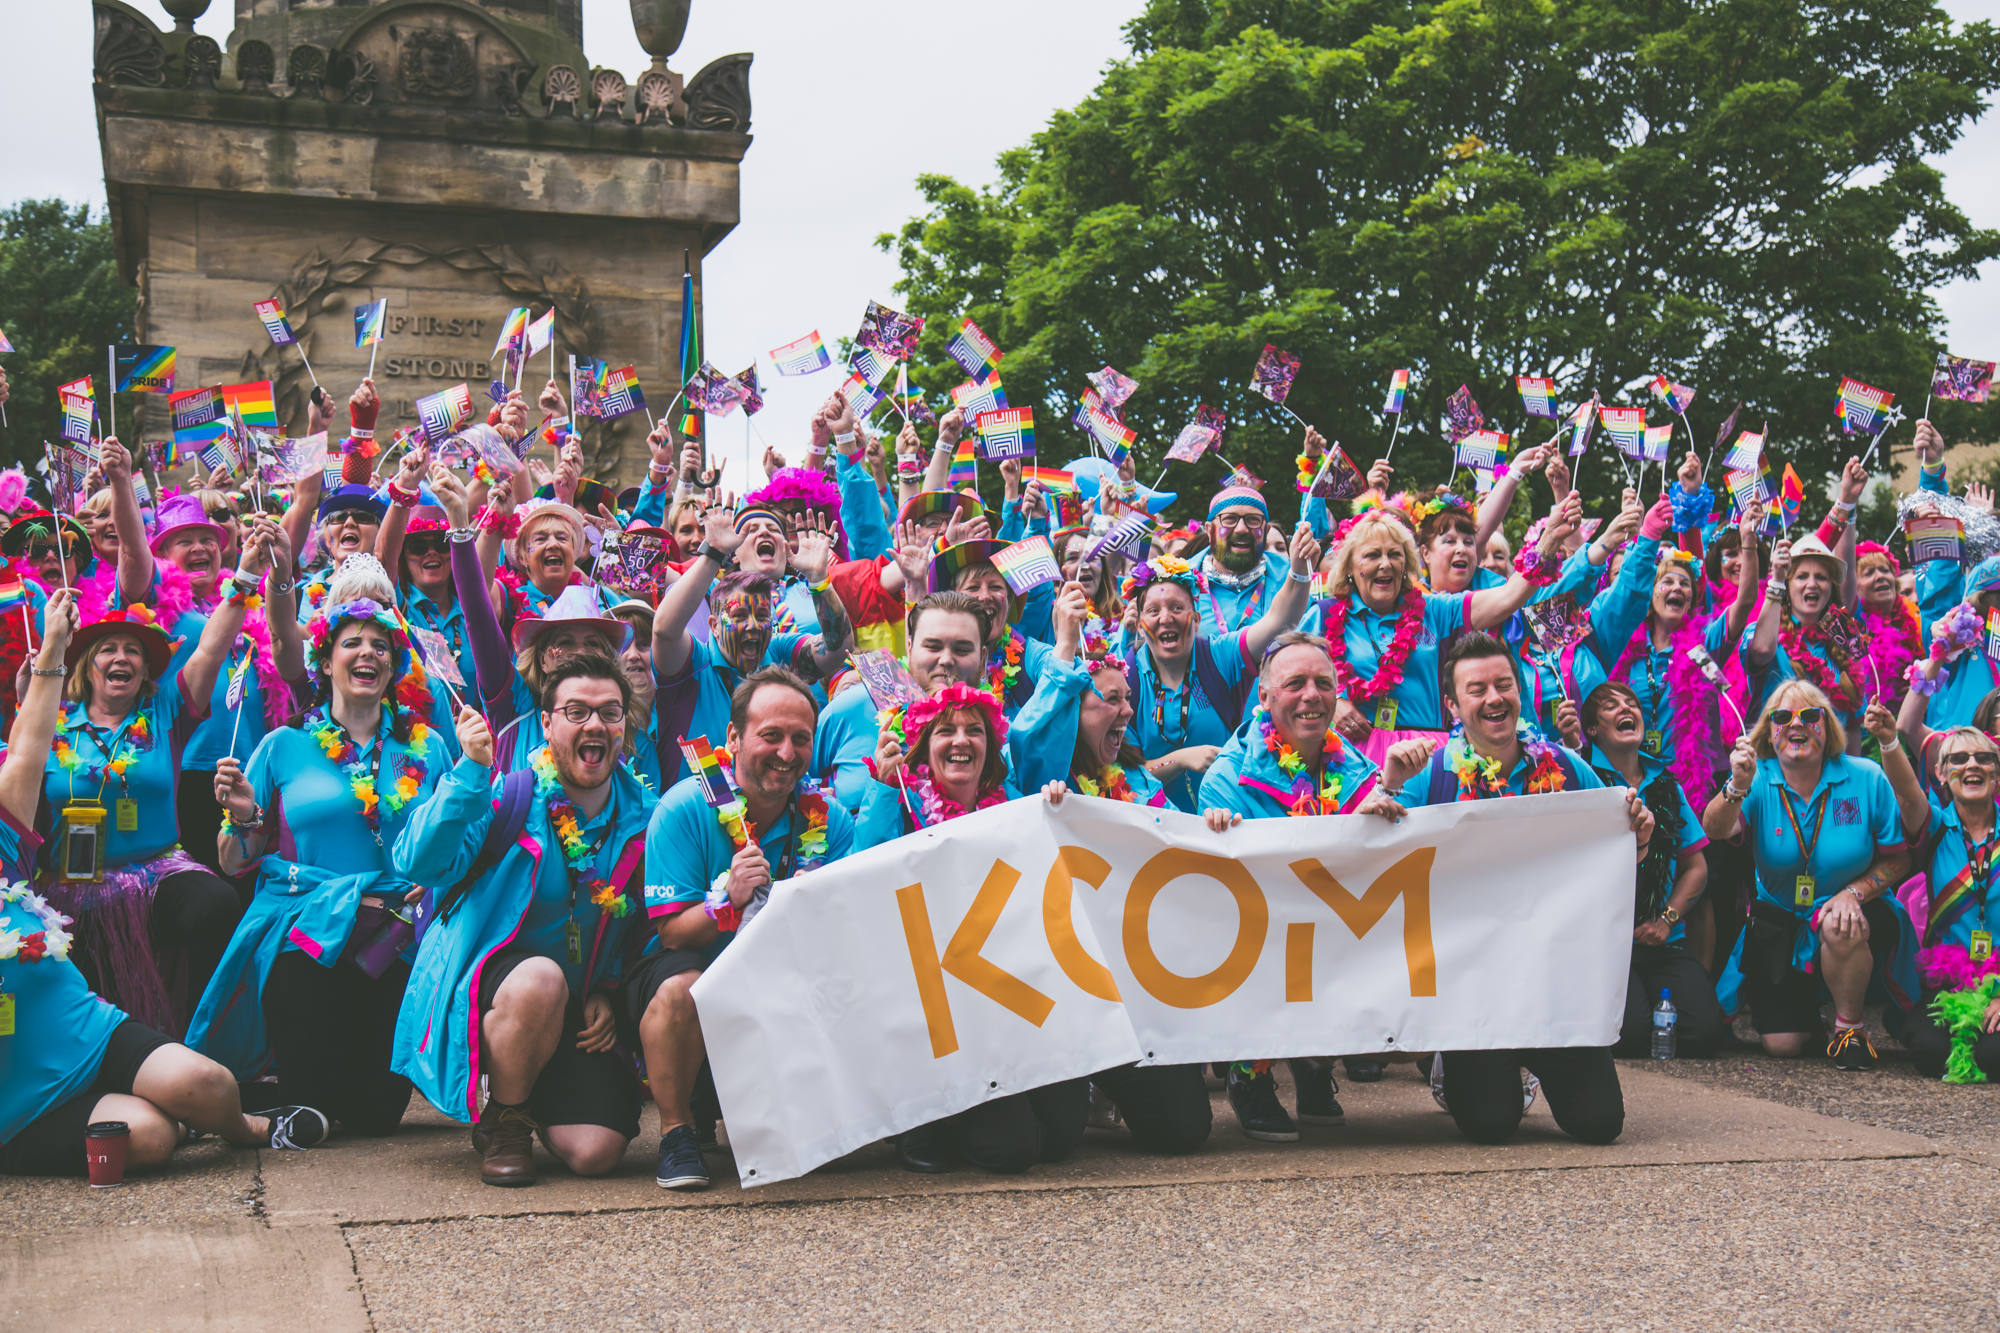 KCOM volunteer group